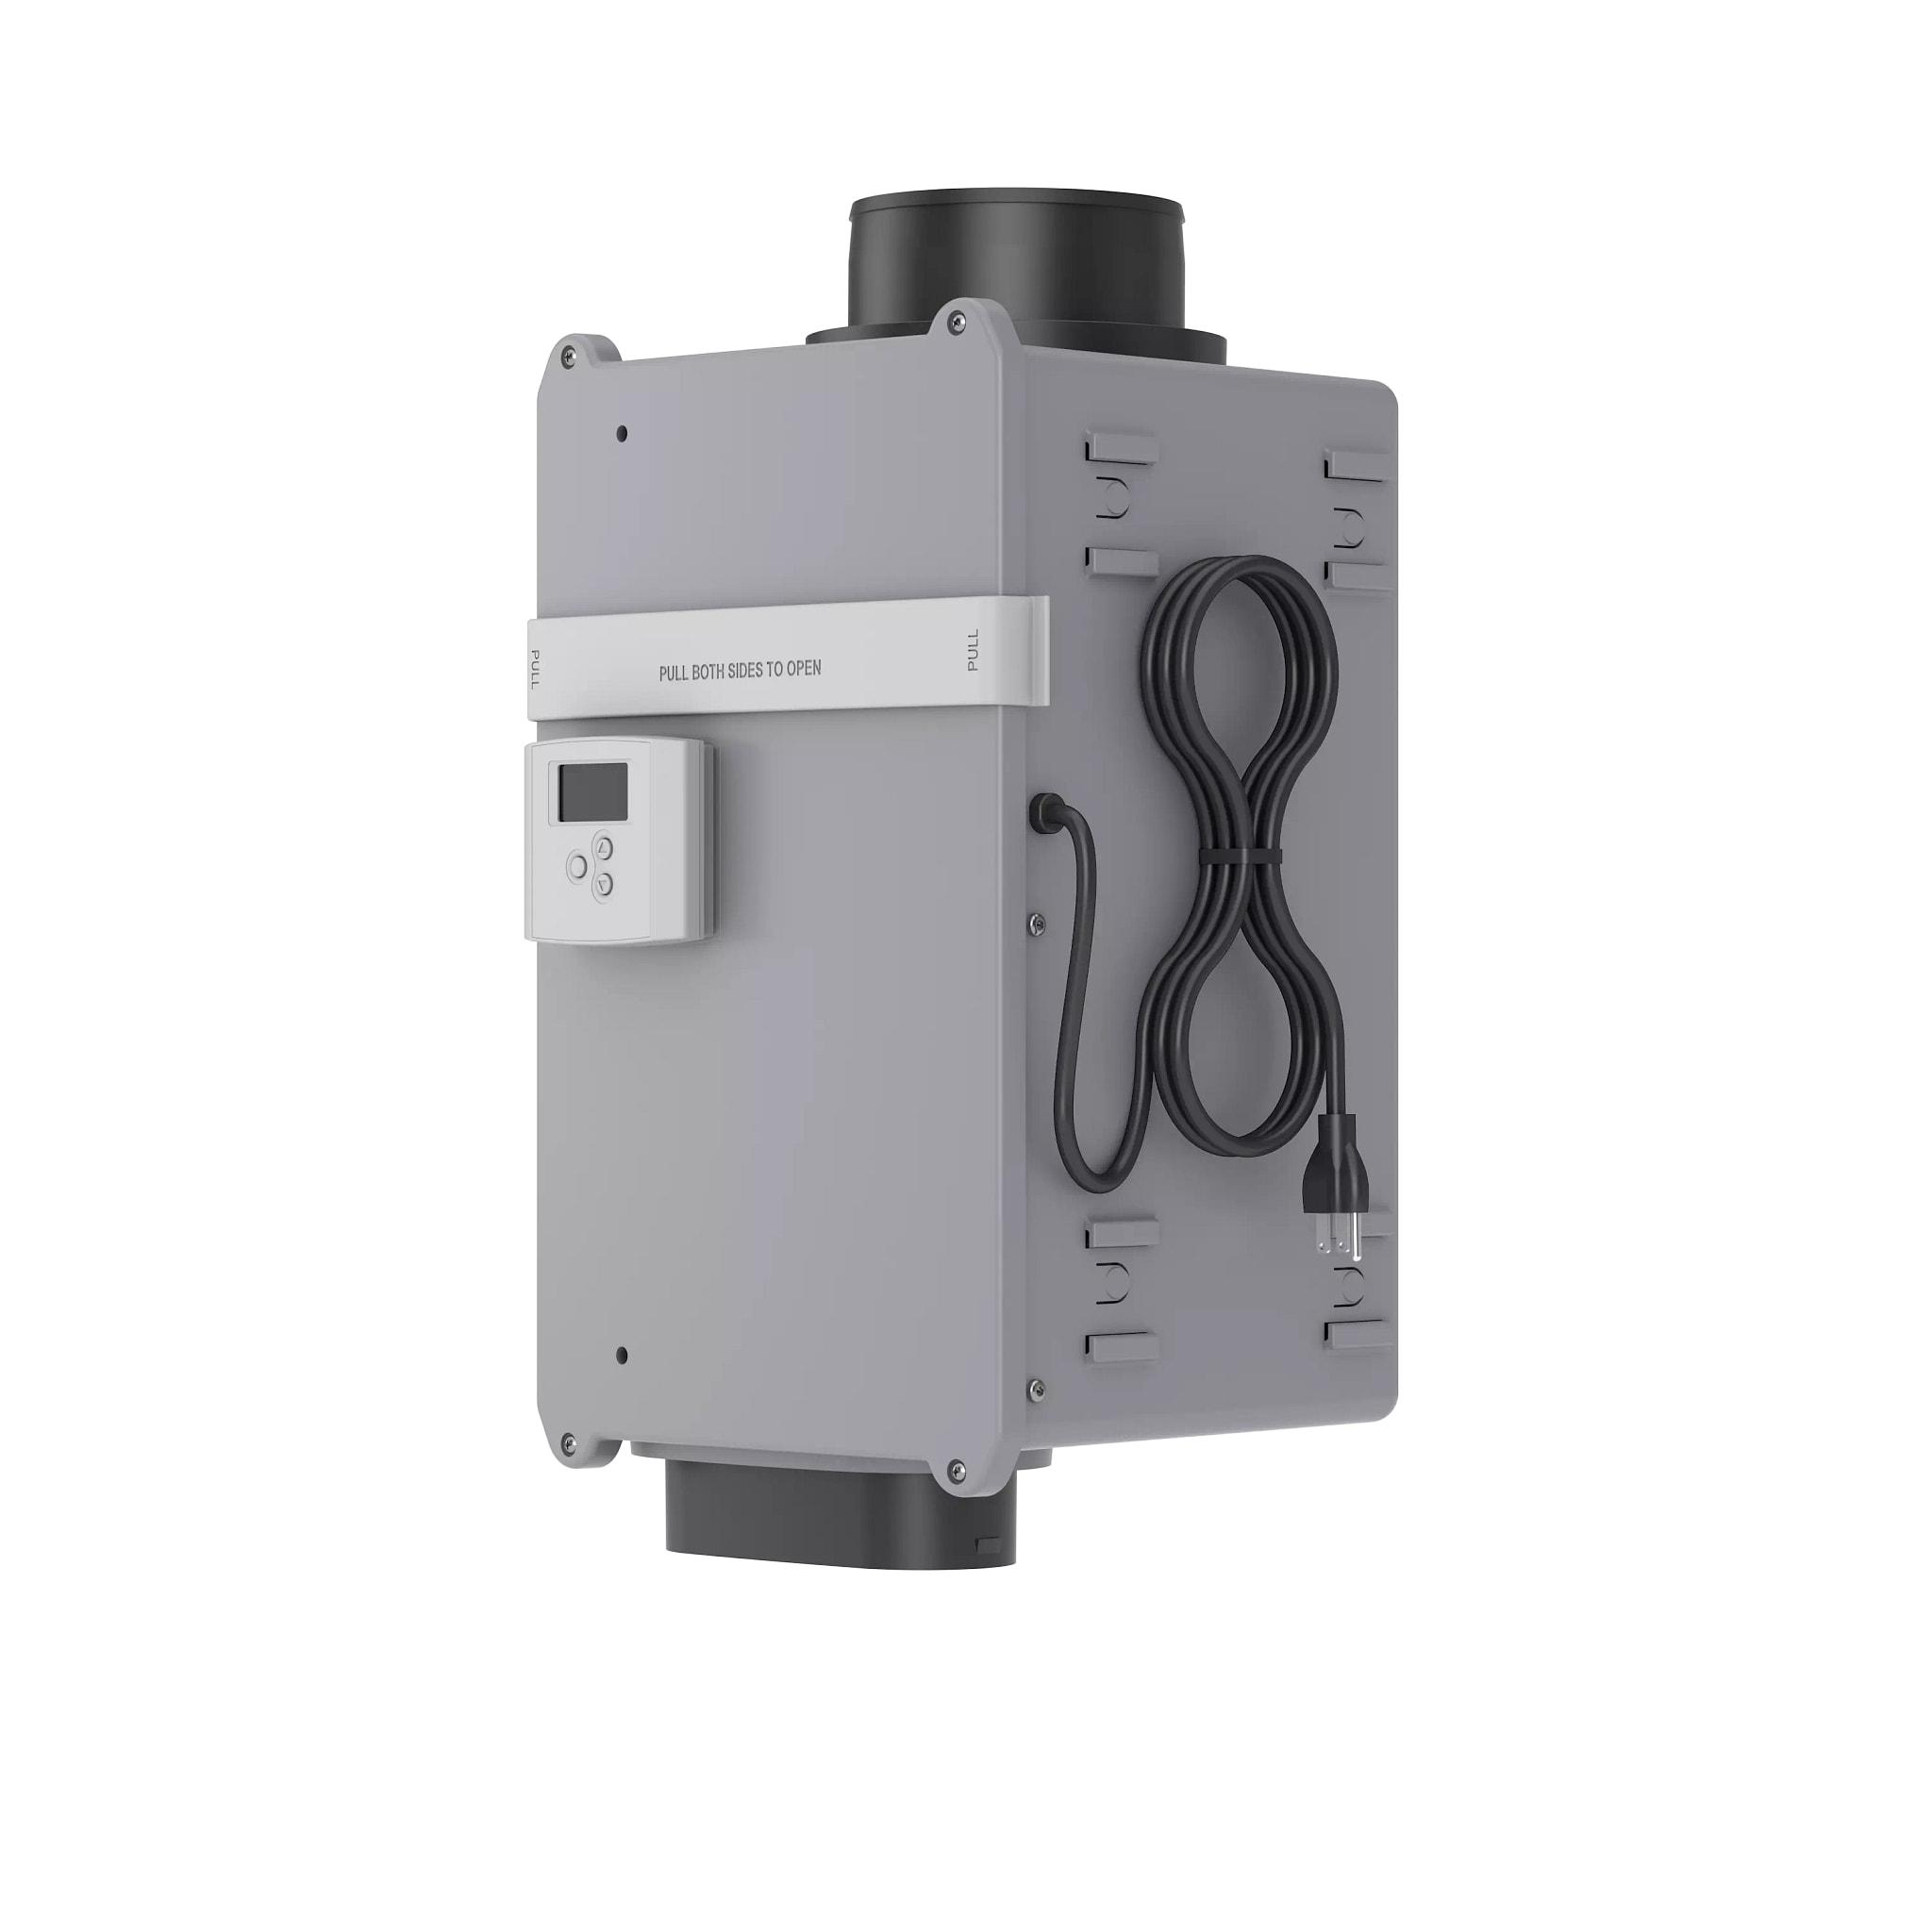 Aprilaire Fresh Air Ventilator (Model 8145